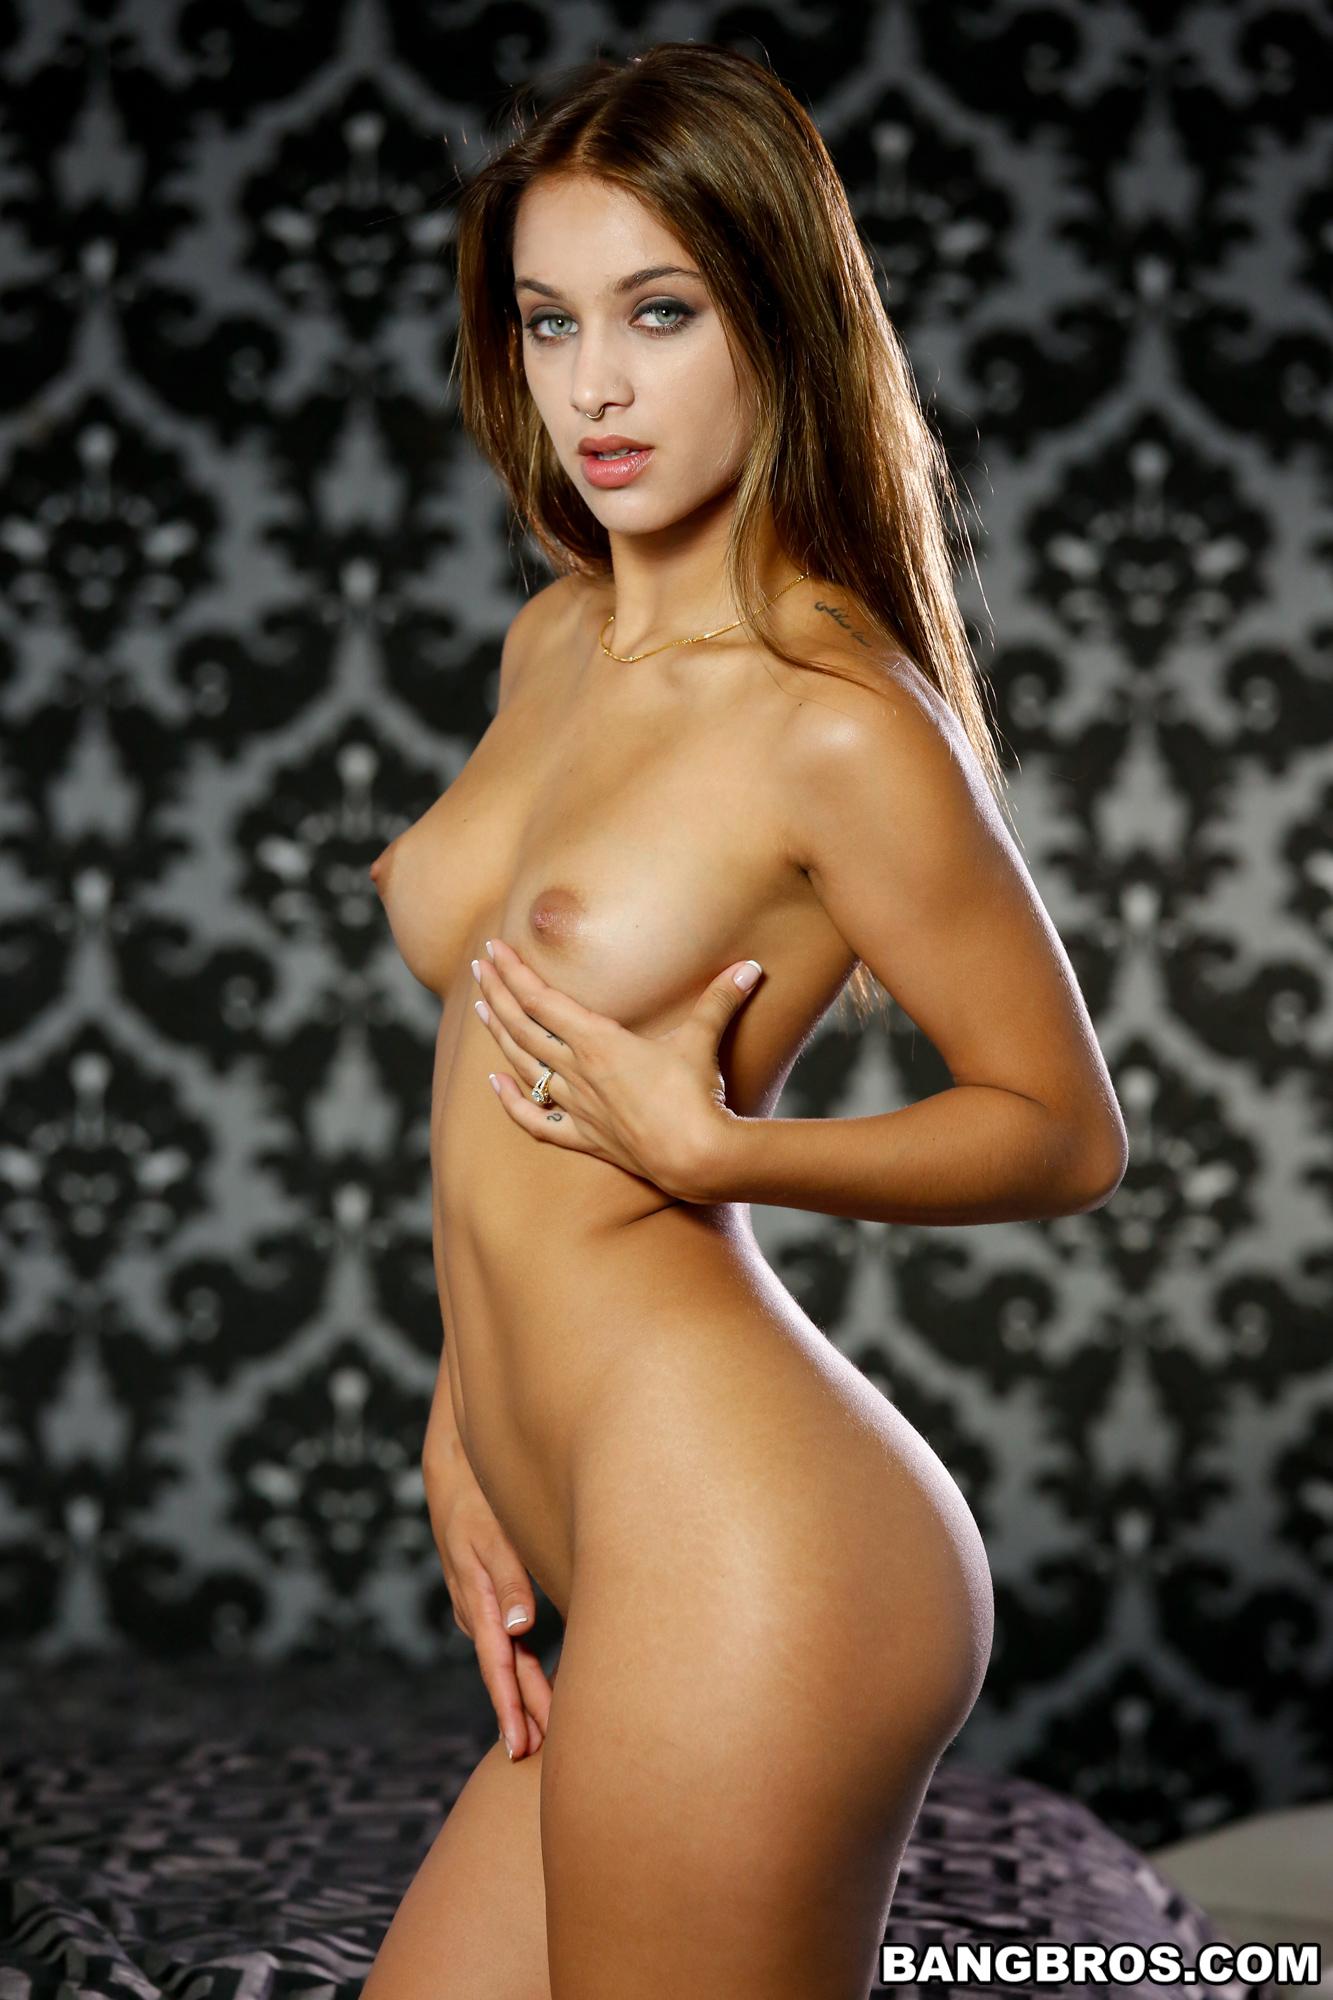 Uma Jolie muestra su conchita fenomenal